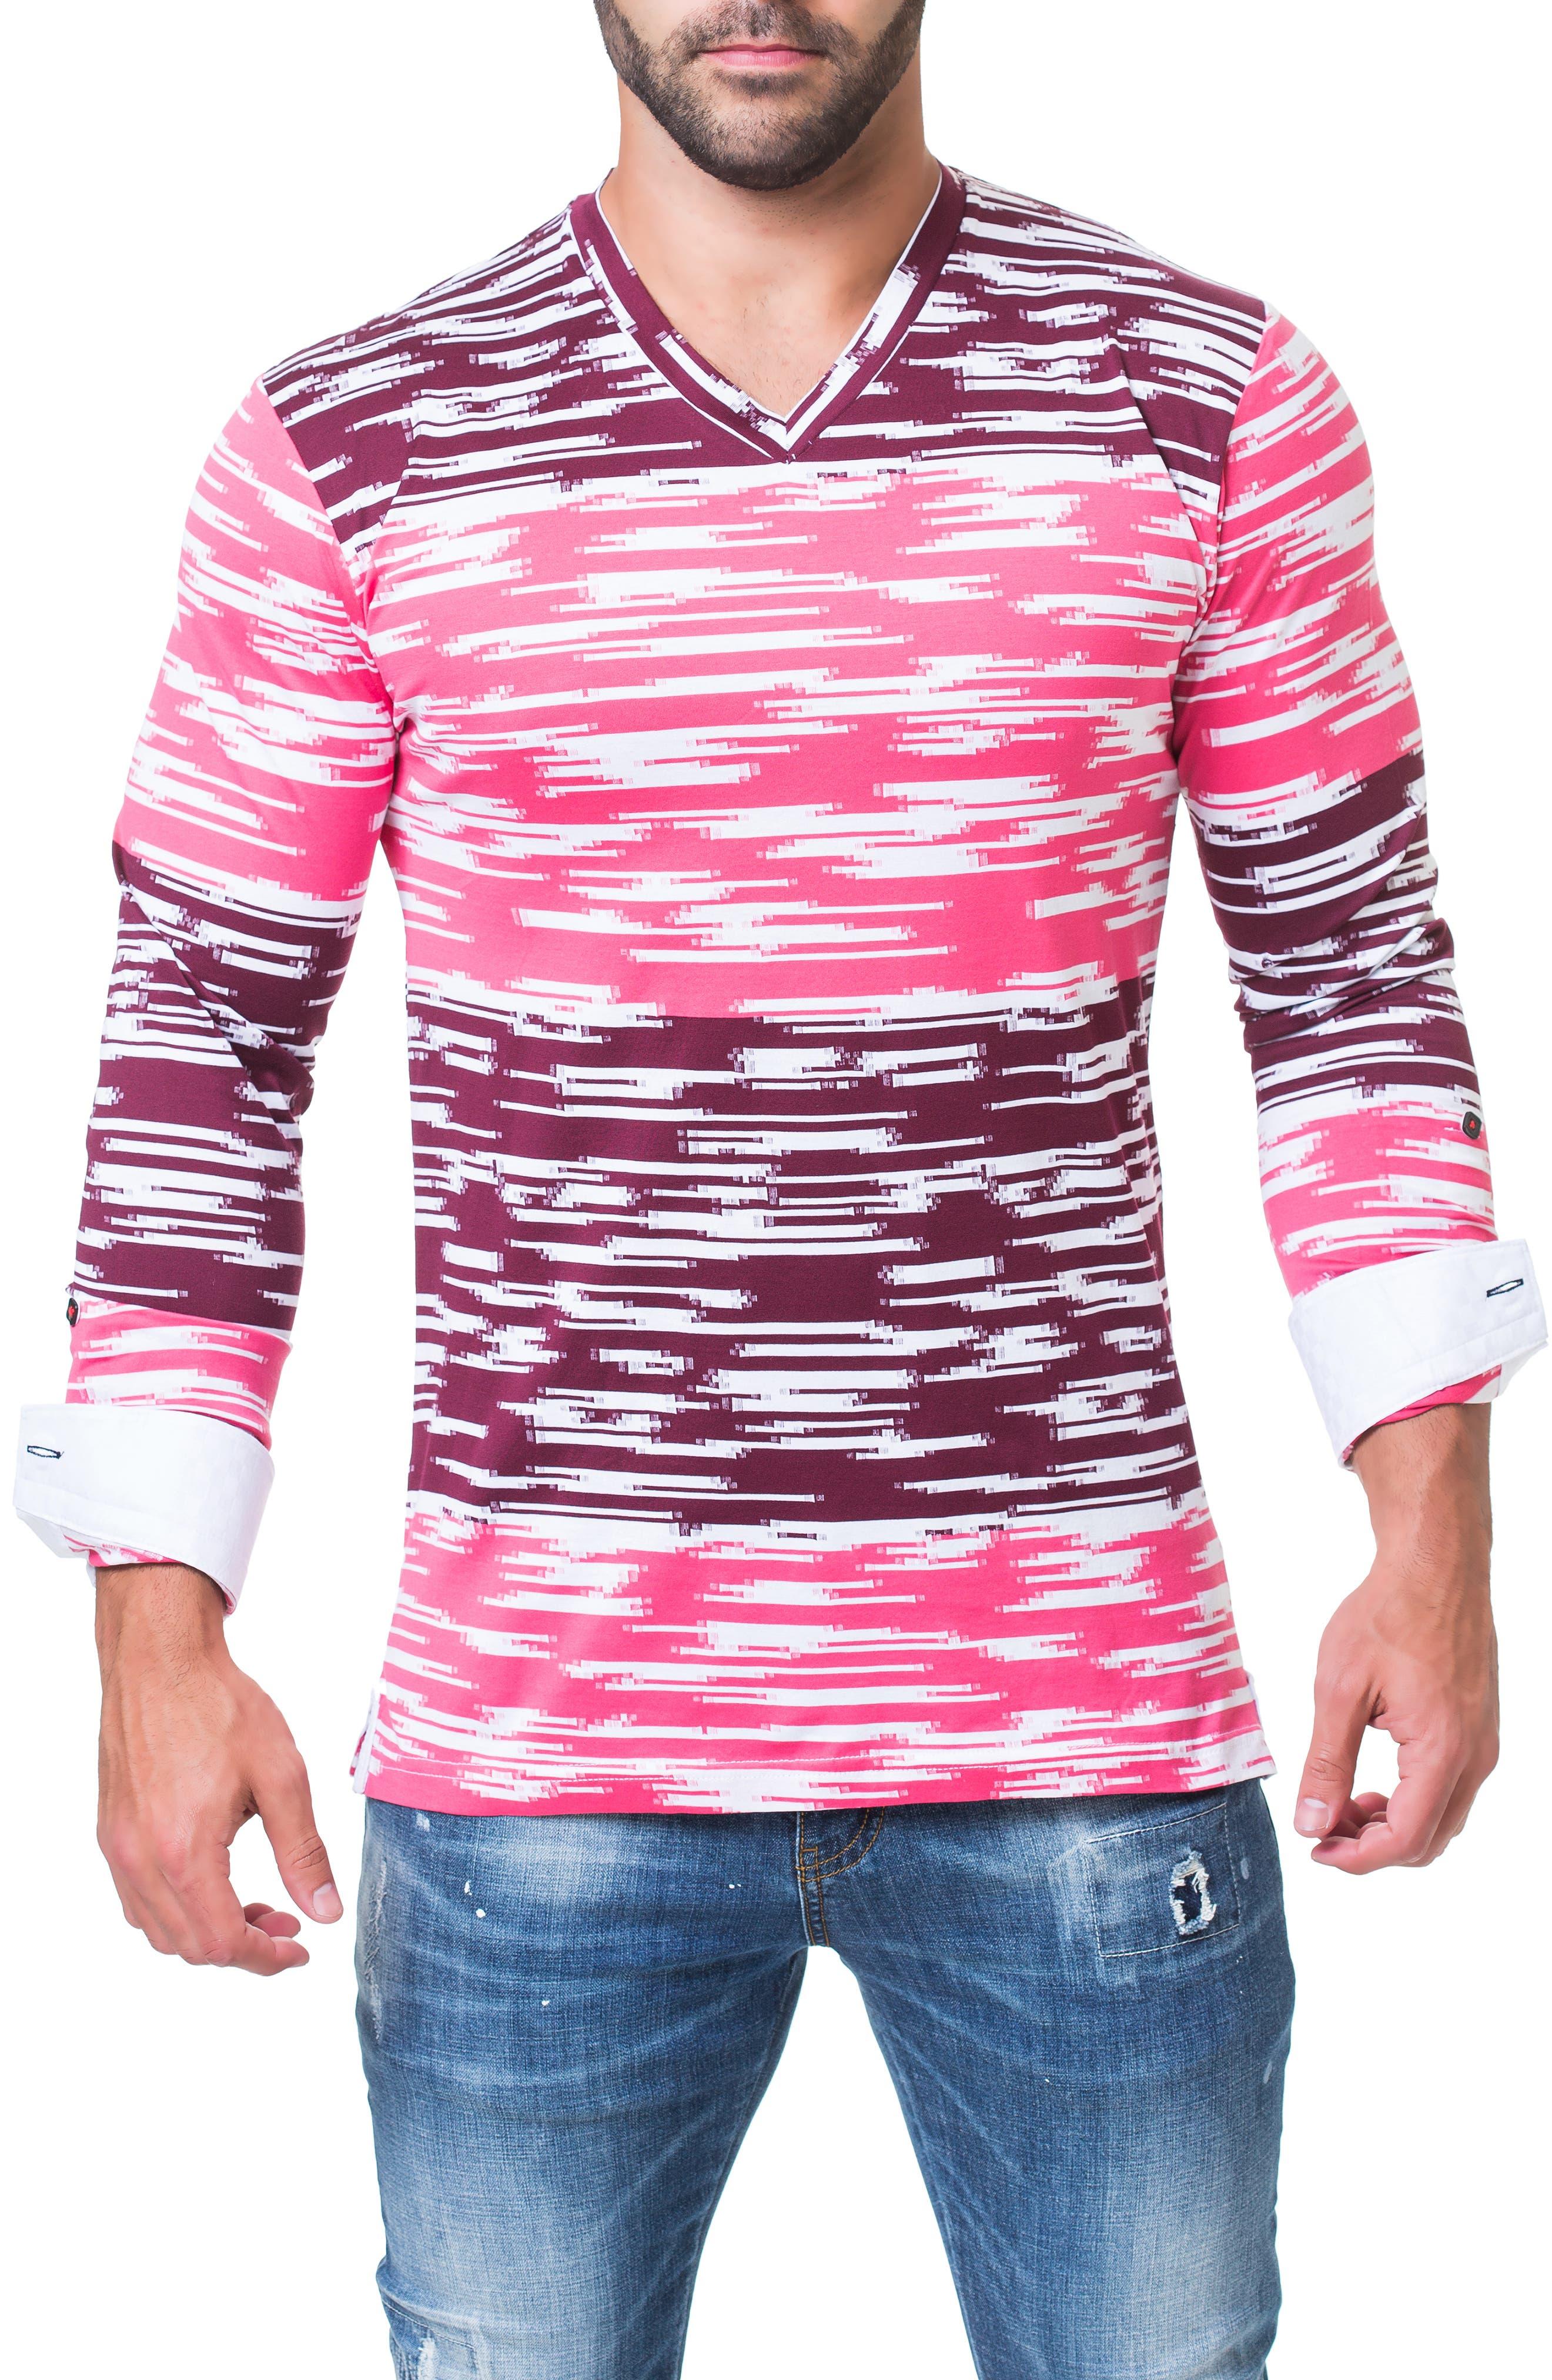 Edison Trim Fit Print T-Shirt,                             Alternate thumbnail 4, color,                             BLACK